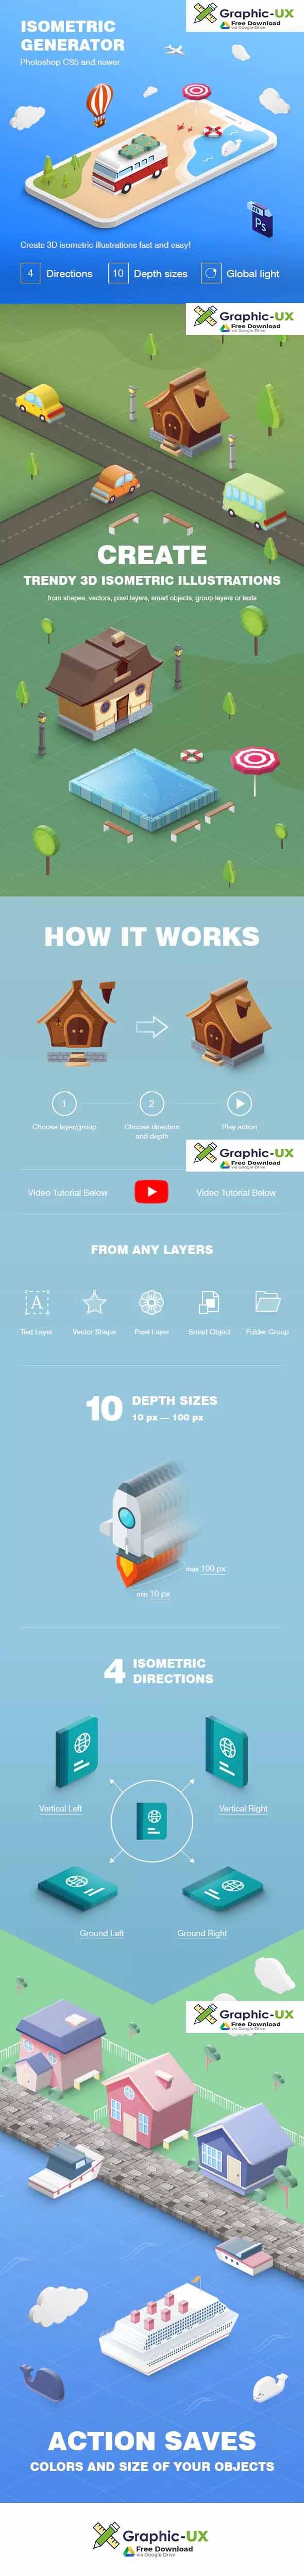 Isometric Illustration - 3D Generator free – GraphicUX